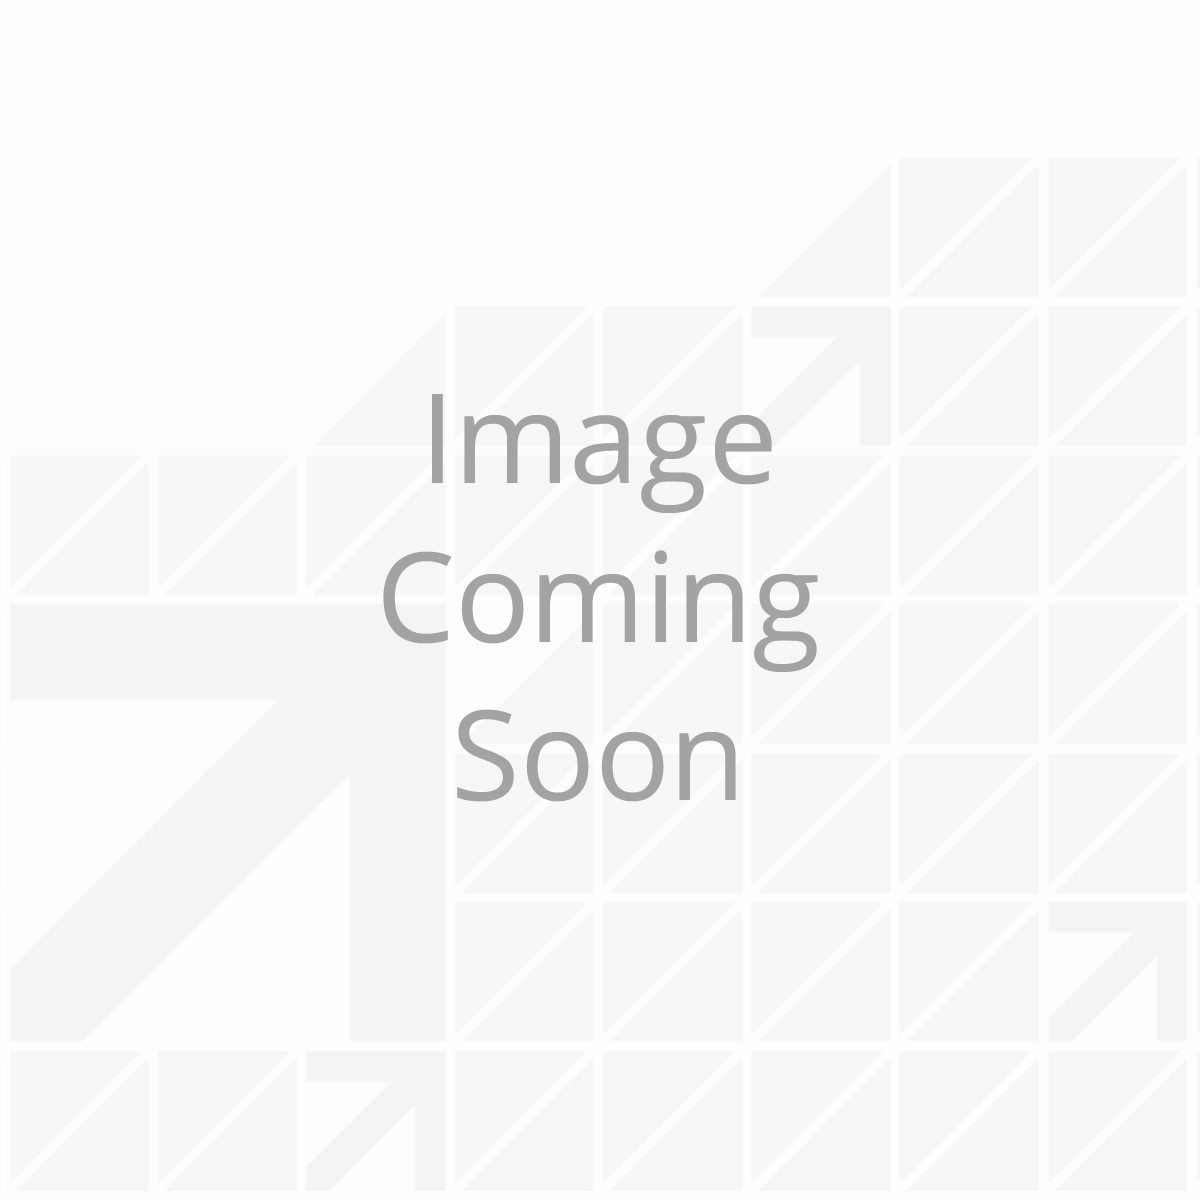 Gear Motor Assembly - Double Shaft (High Torque)